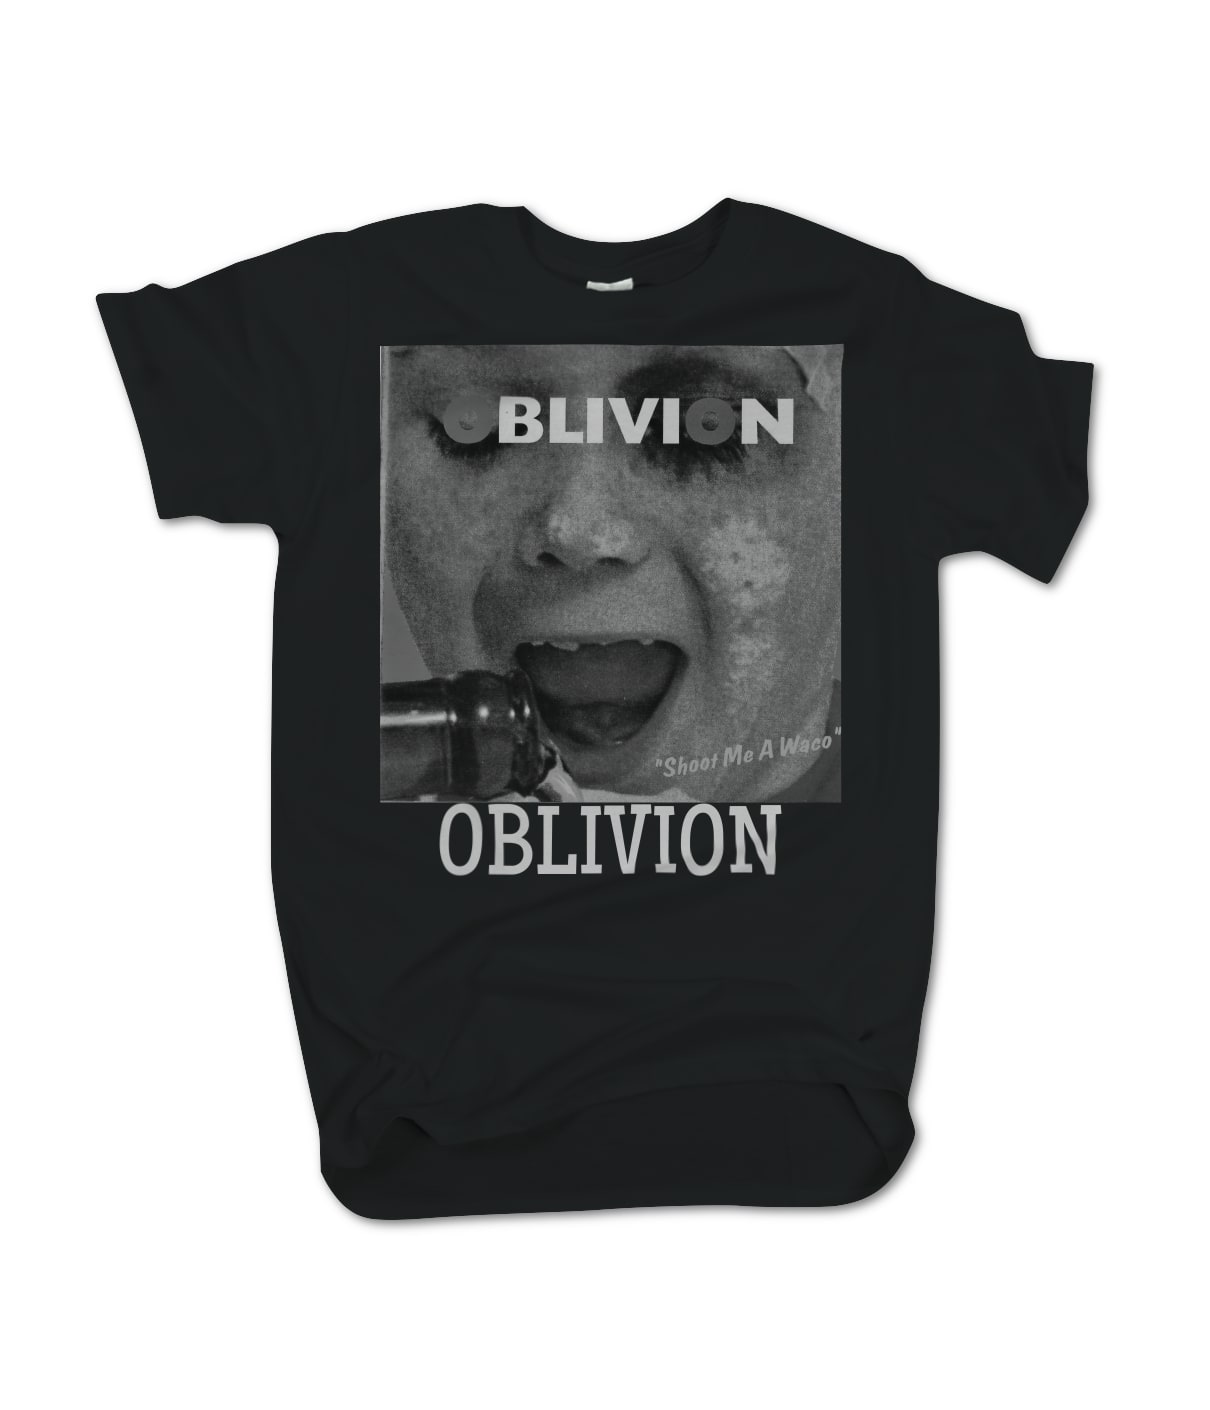 Oblivion oblivionshootmeb 1528063896